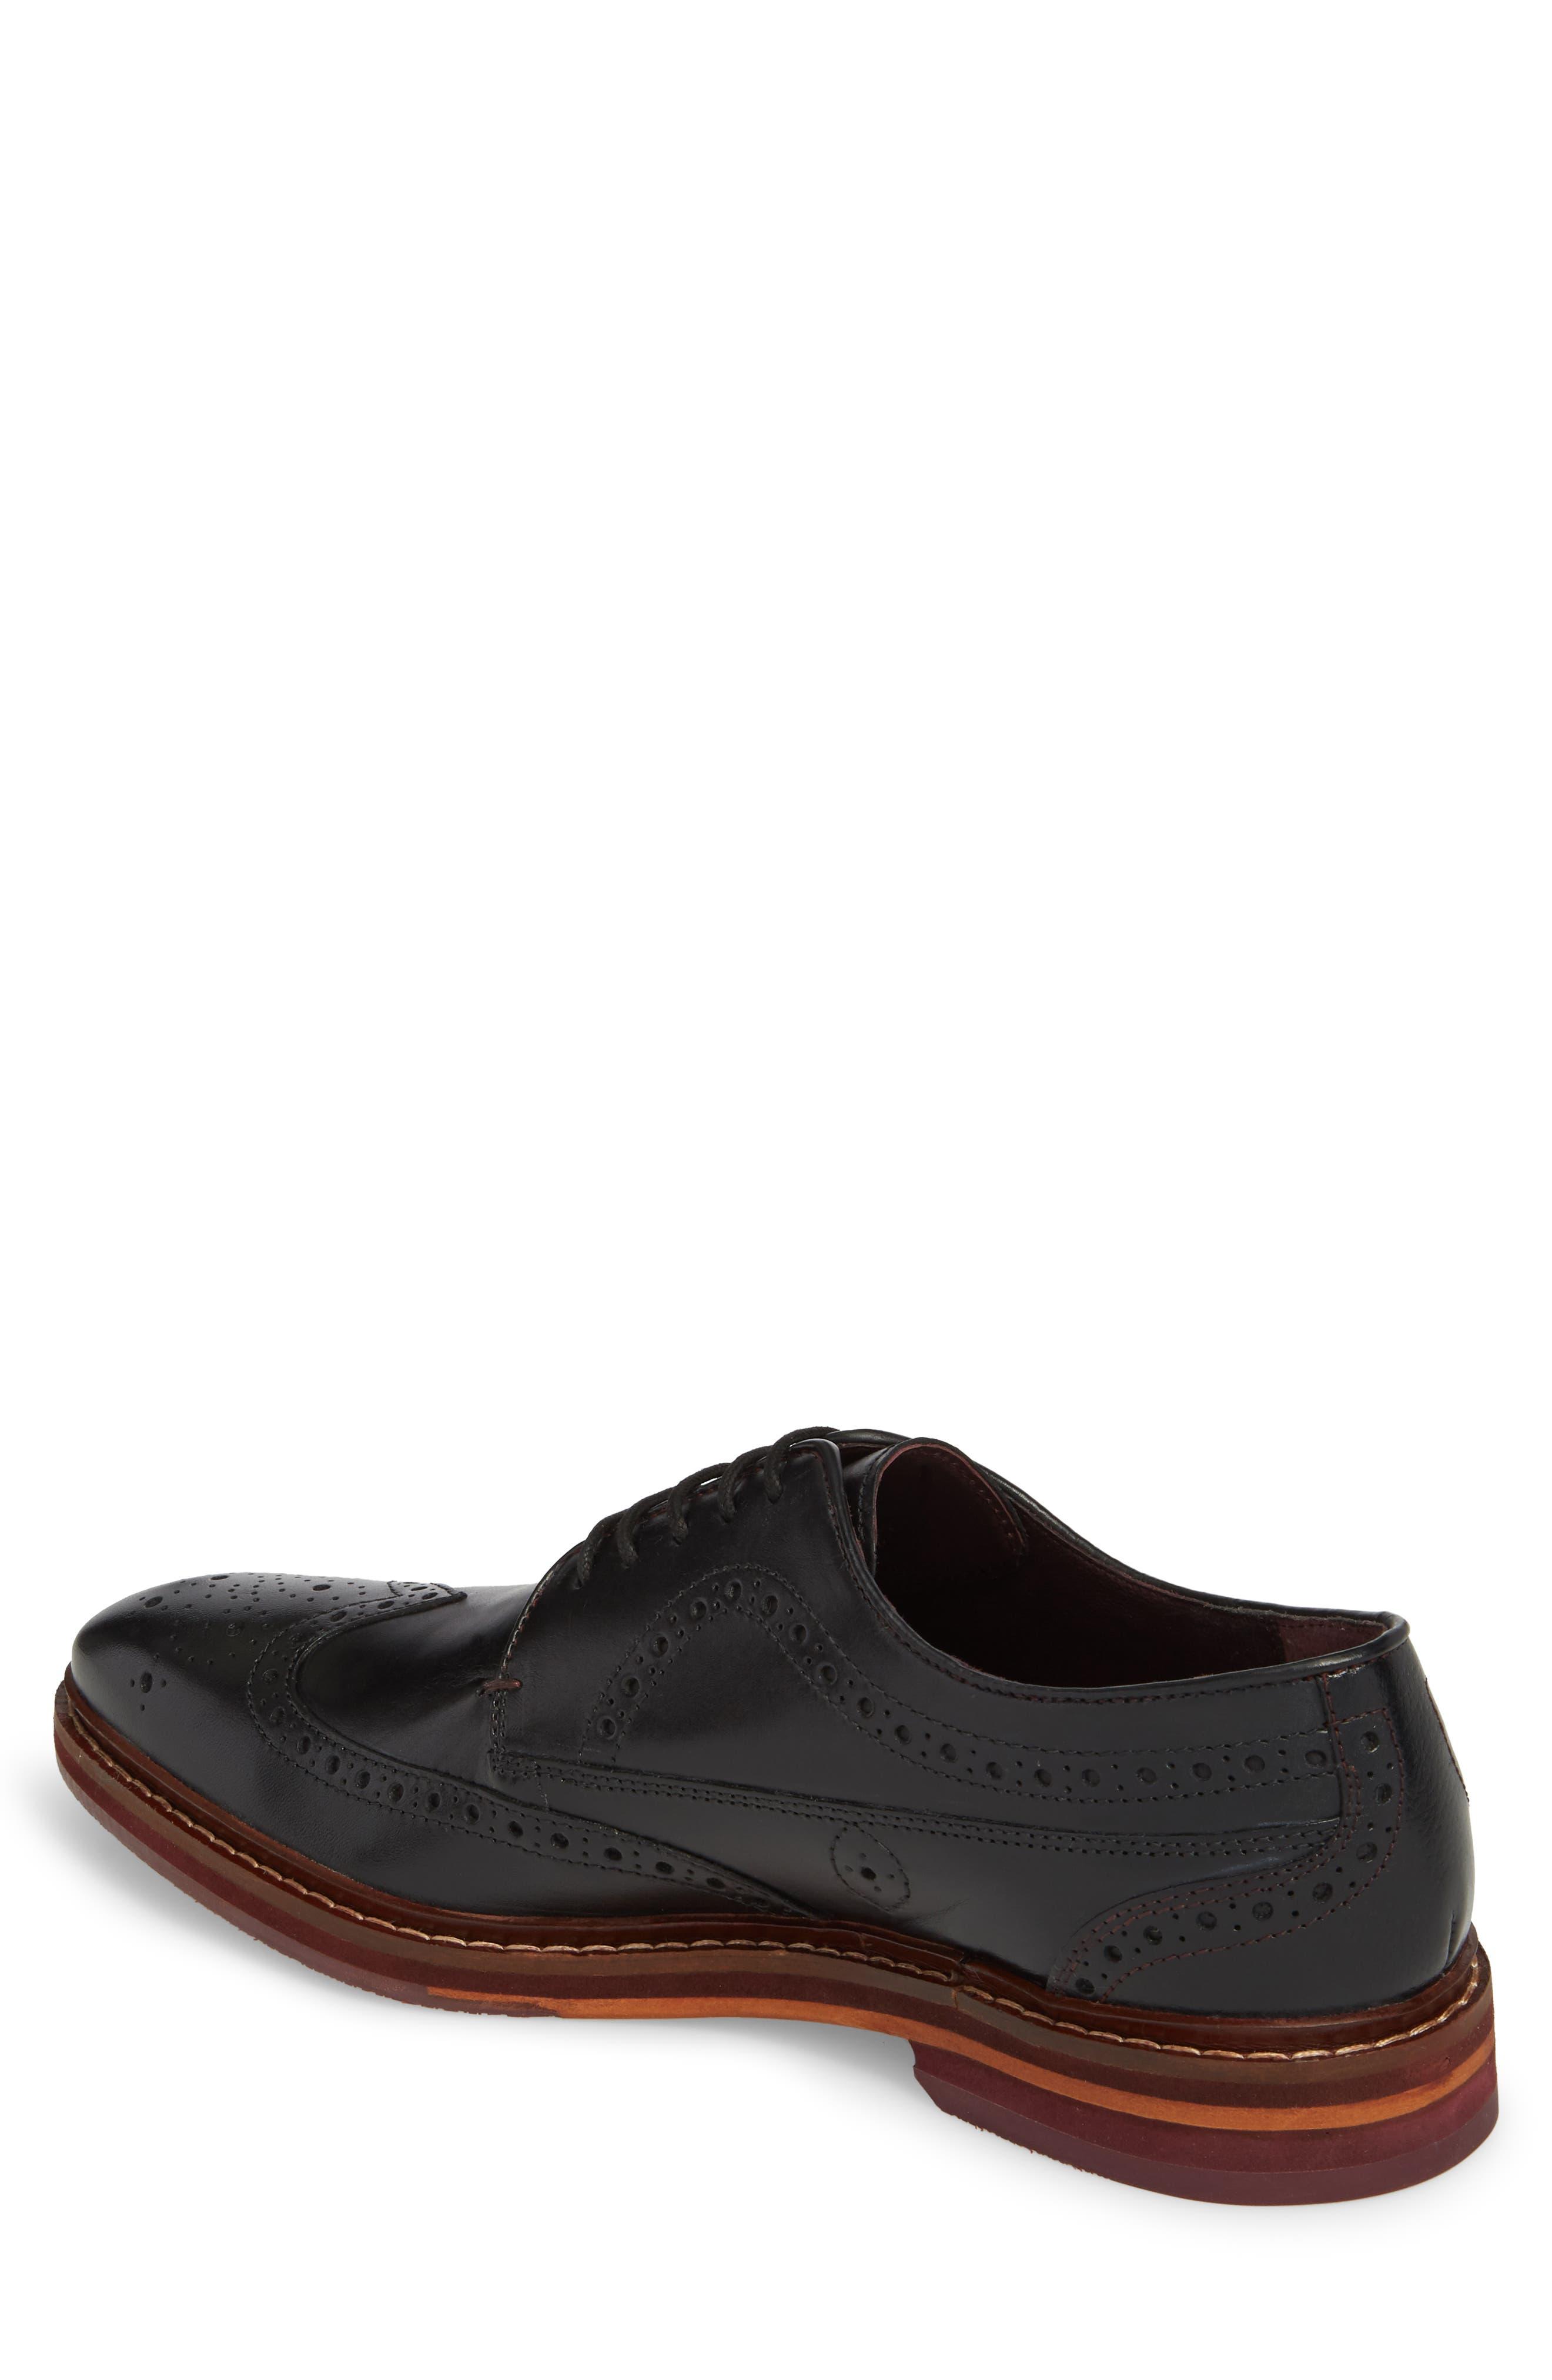 Gourdon Wingtip Derby,                             Alternate thumbnail 2, color,                             Black Leather